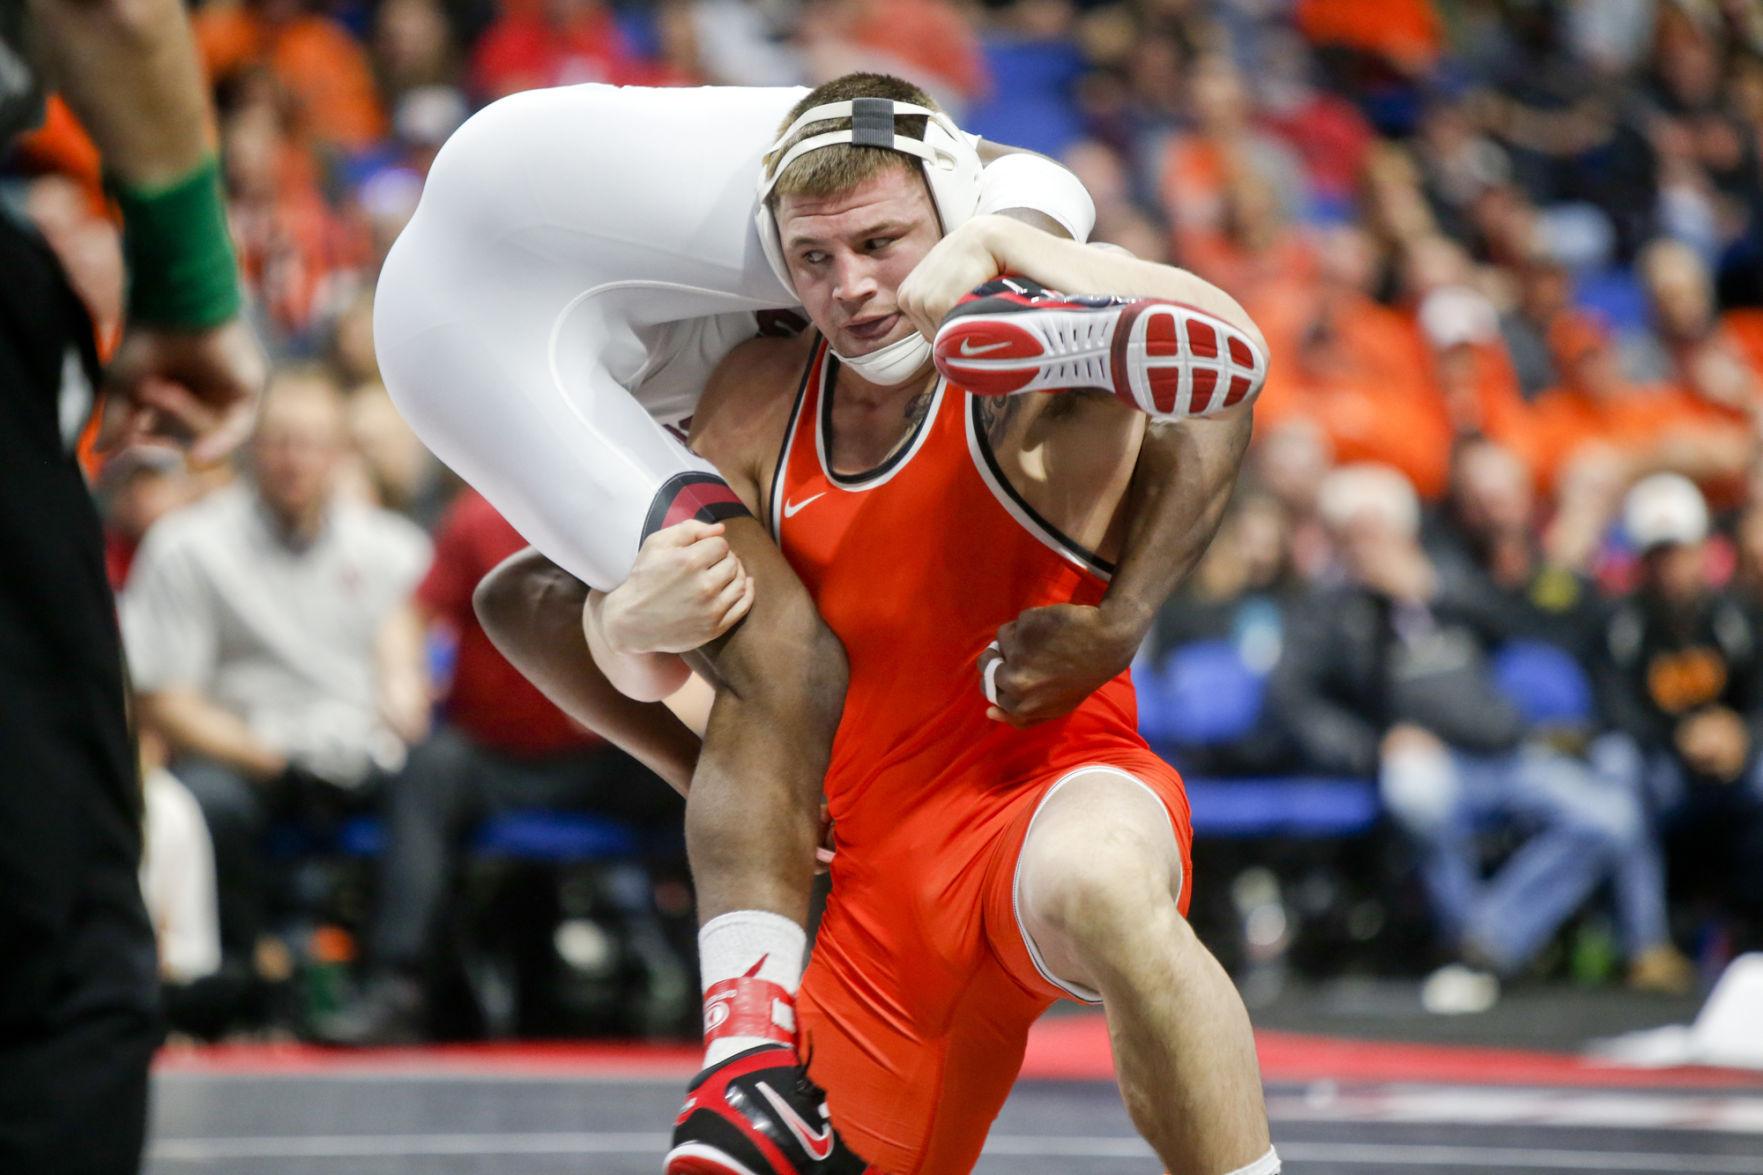 Five Missouri wrestlers advance to quarterfinals at NCAA wrestling championships